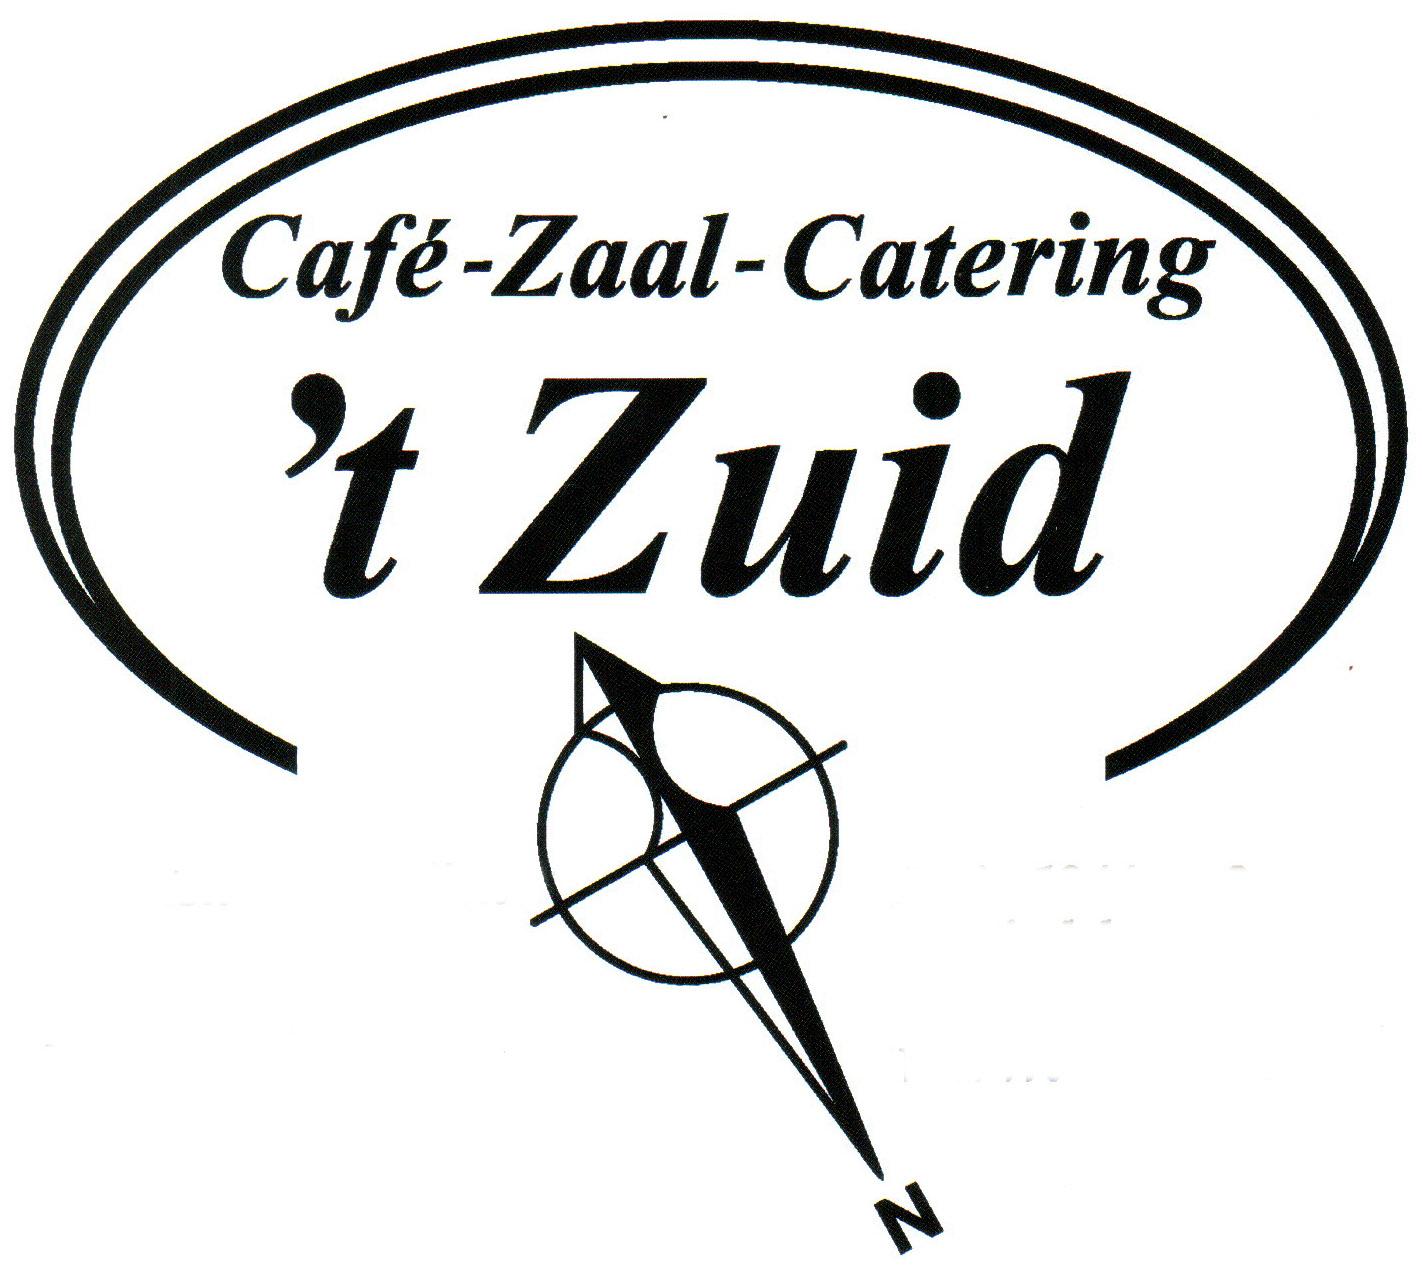 logo cafe t zuid